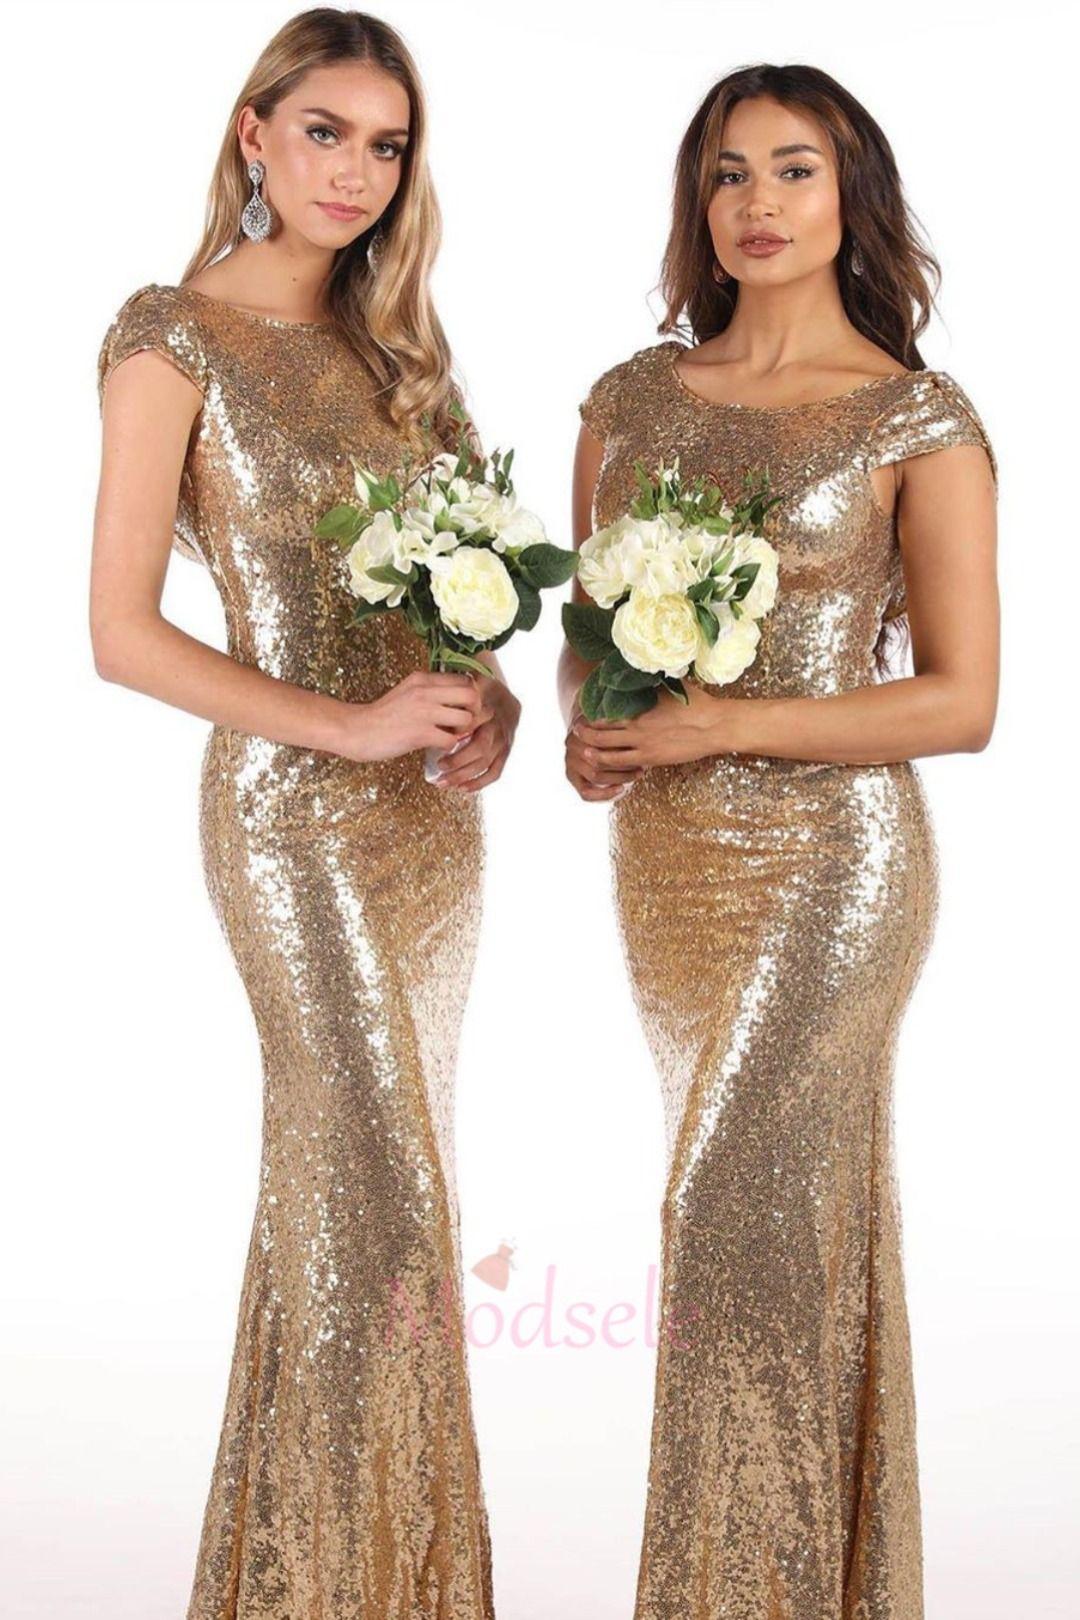 Top 10 Popular Champagne Bridesmaid Dresses Champagne Bridesmaid Dresses Senior Prom Dresses Mermaid Long Bridesmaid Dresses [ 1620 x 1080 Pixel ]